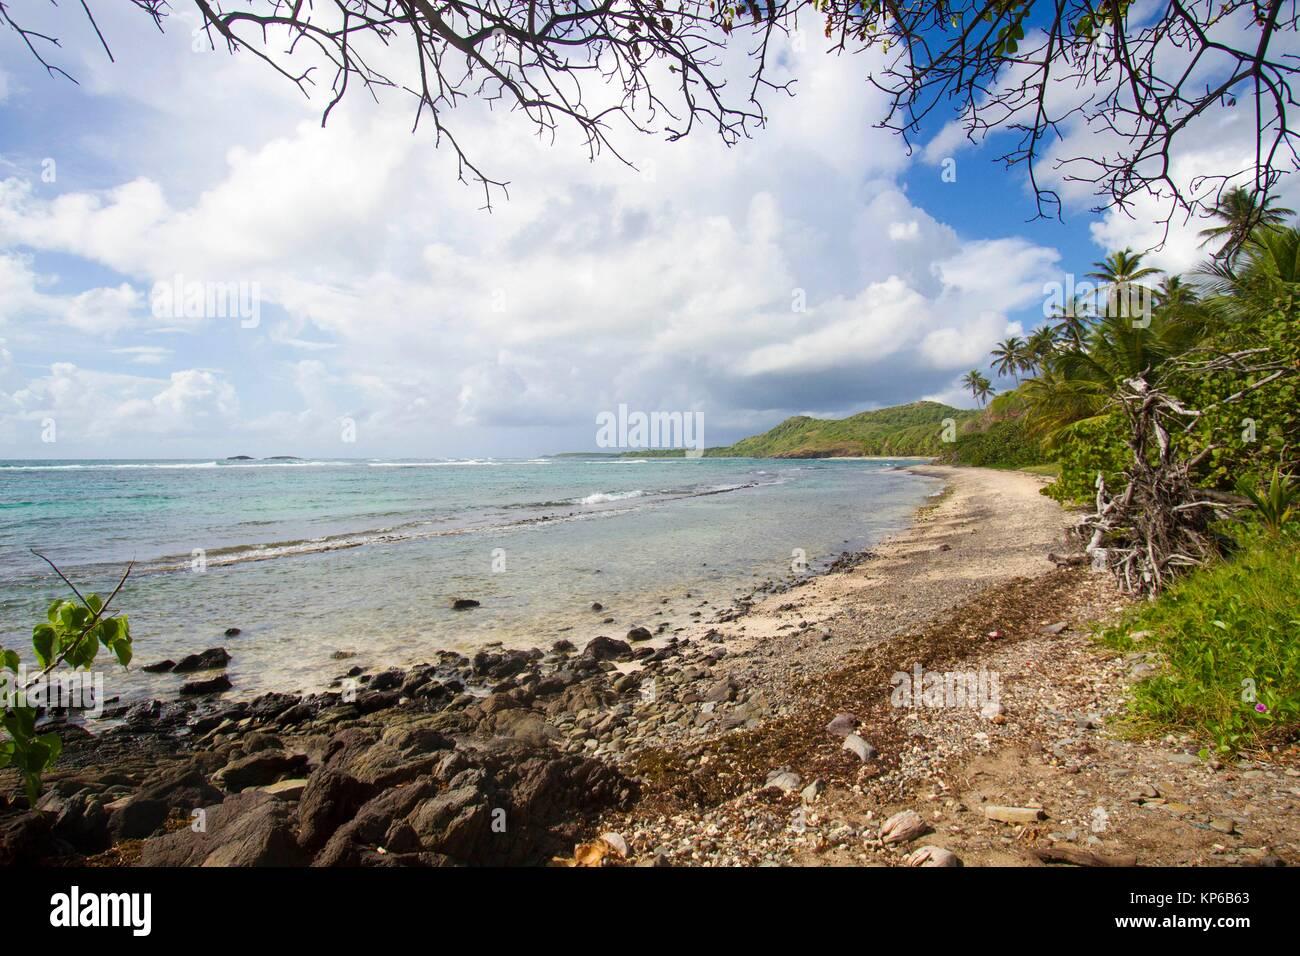 The walk of '' La Trace des Caps'' in Martinique is a 18 kilometres hikes along Cap Ferre, Pointe - Stock Image